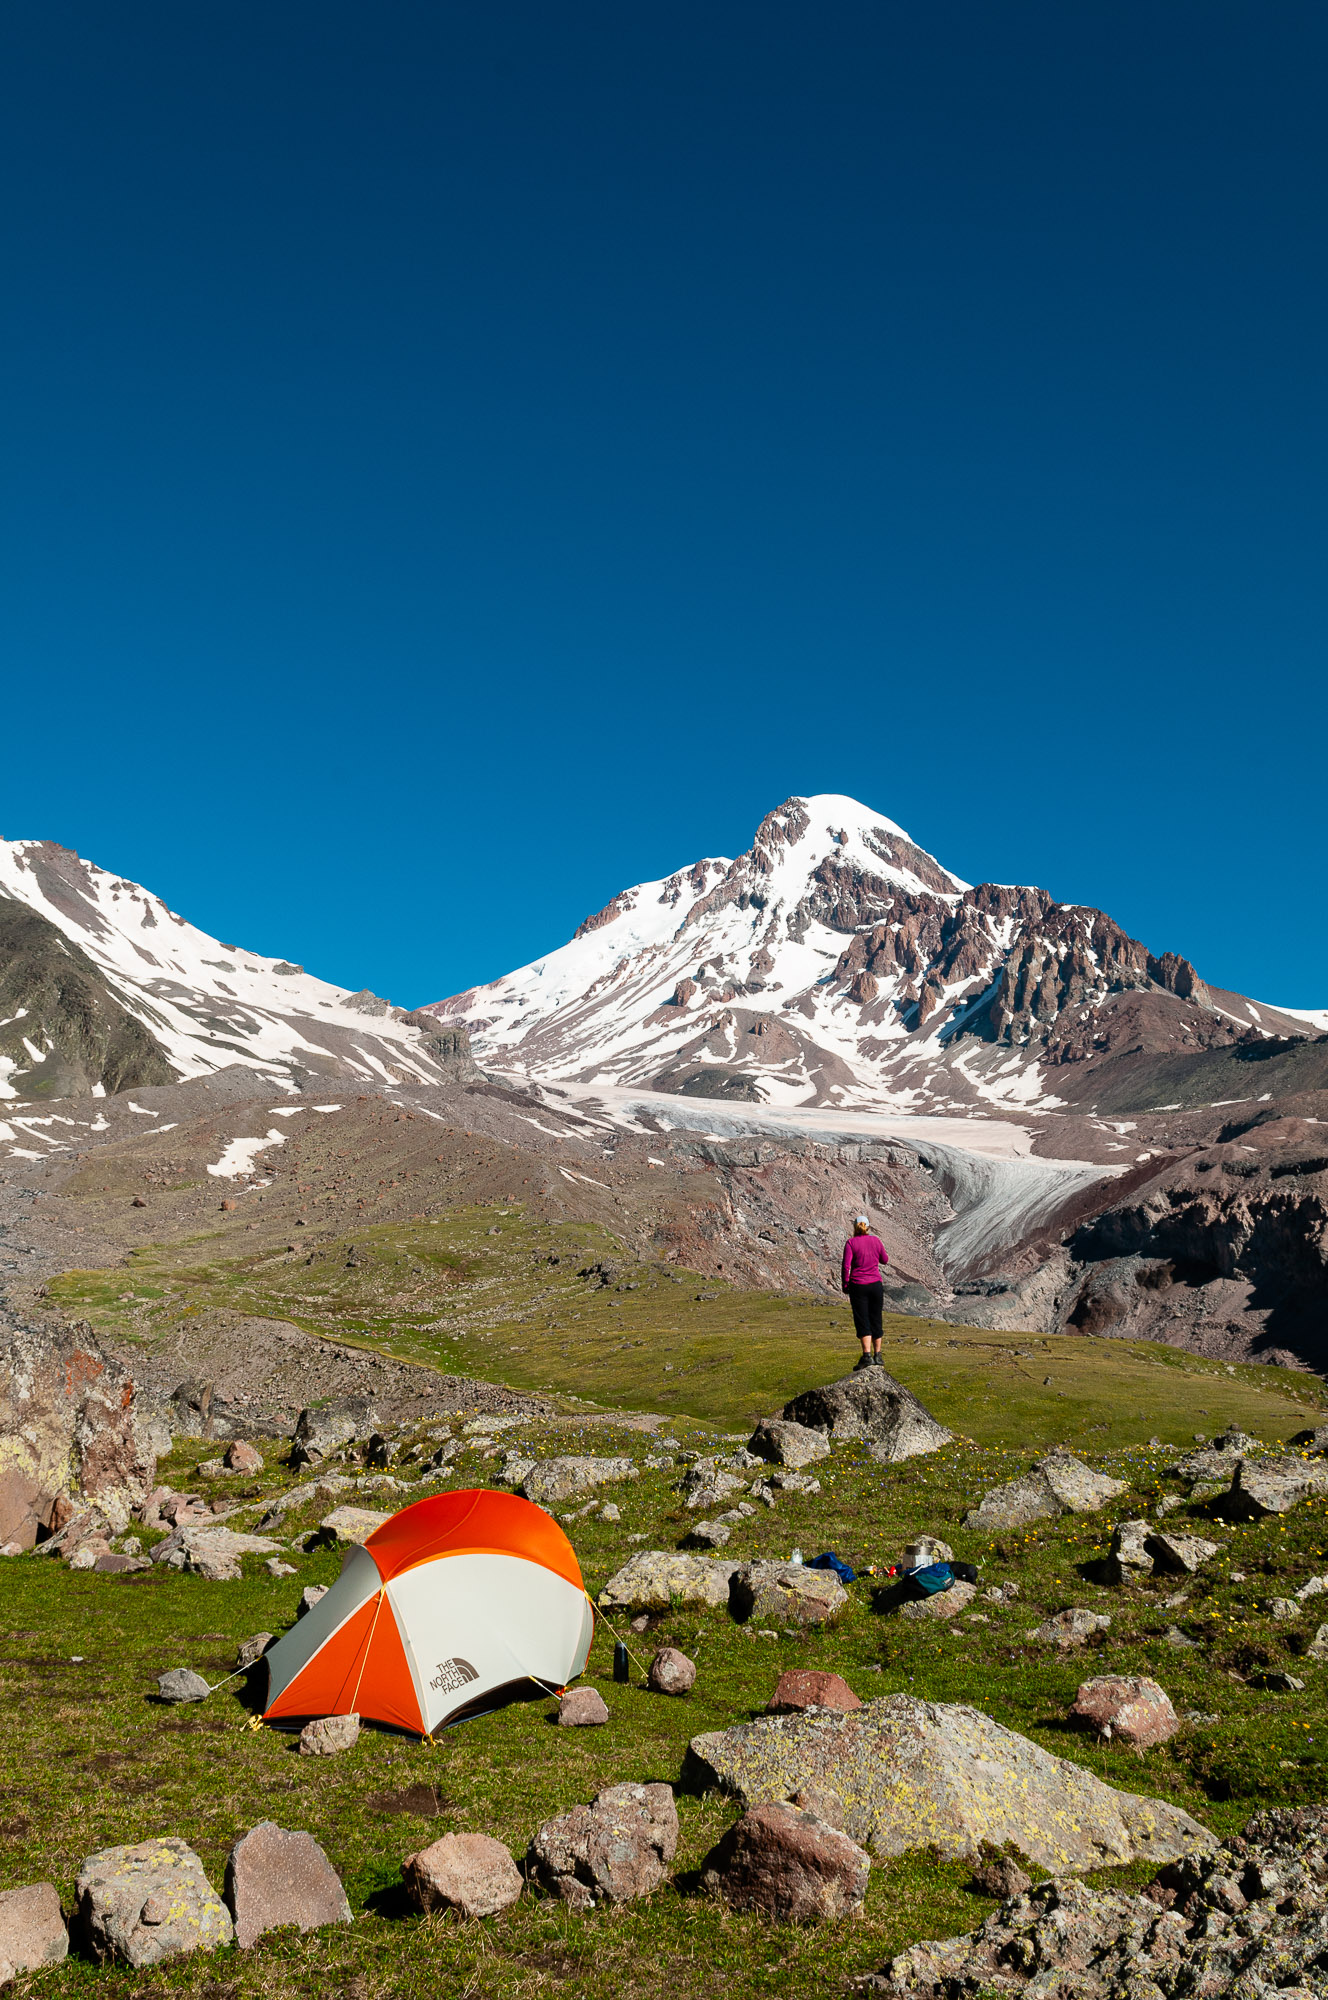 Camping beneath Mt Kazbegi, Georgia. © www.thomaspickard.com